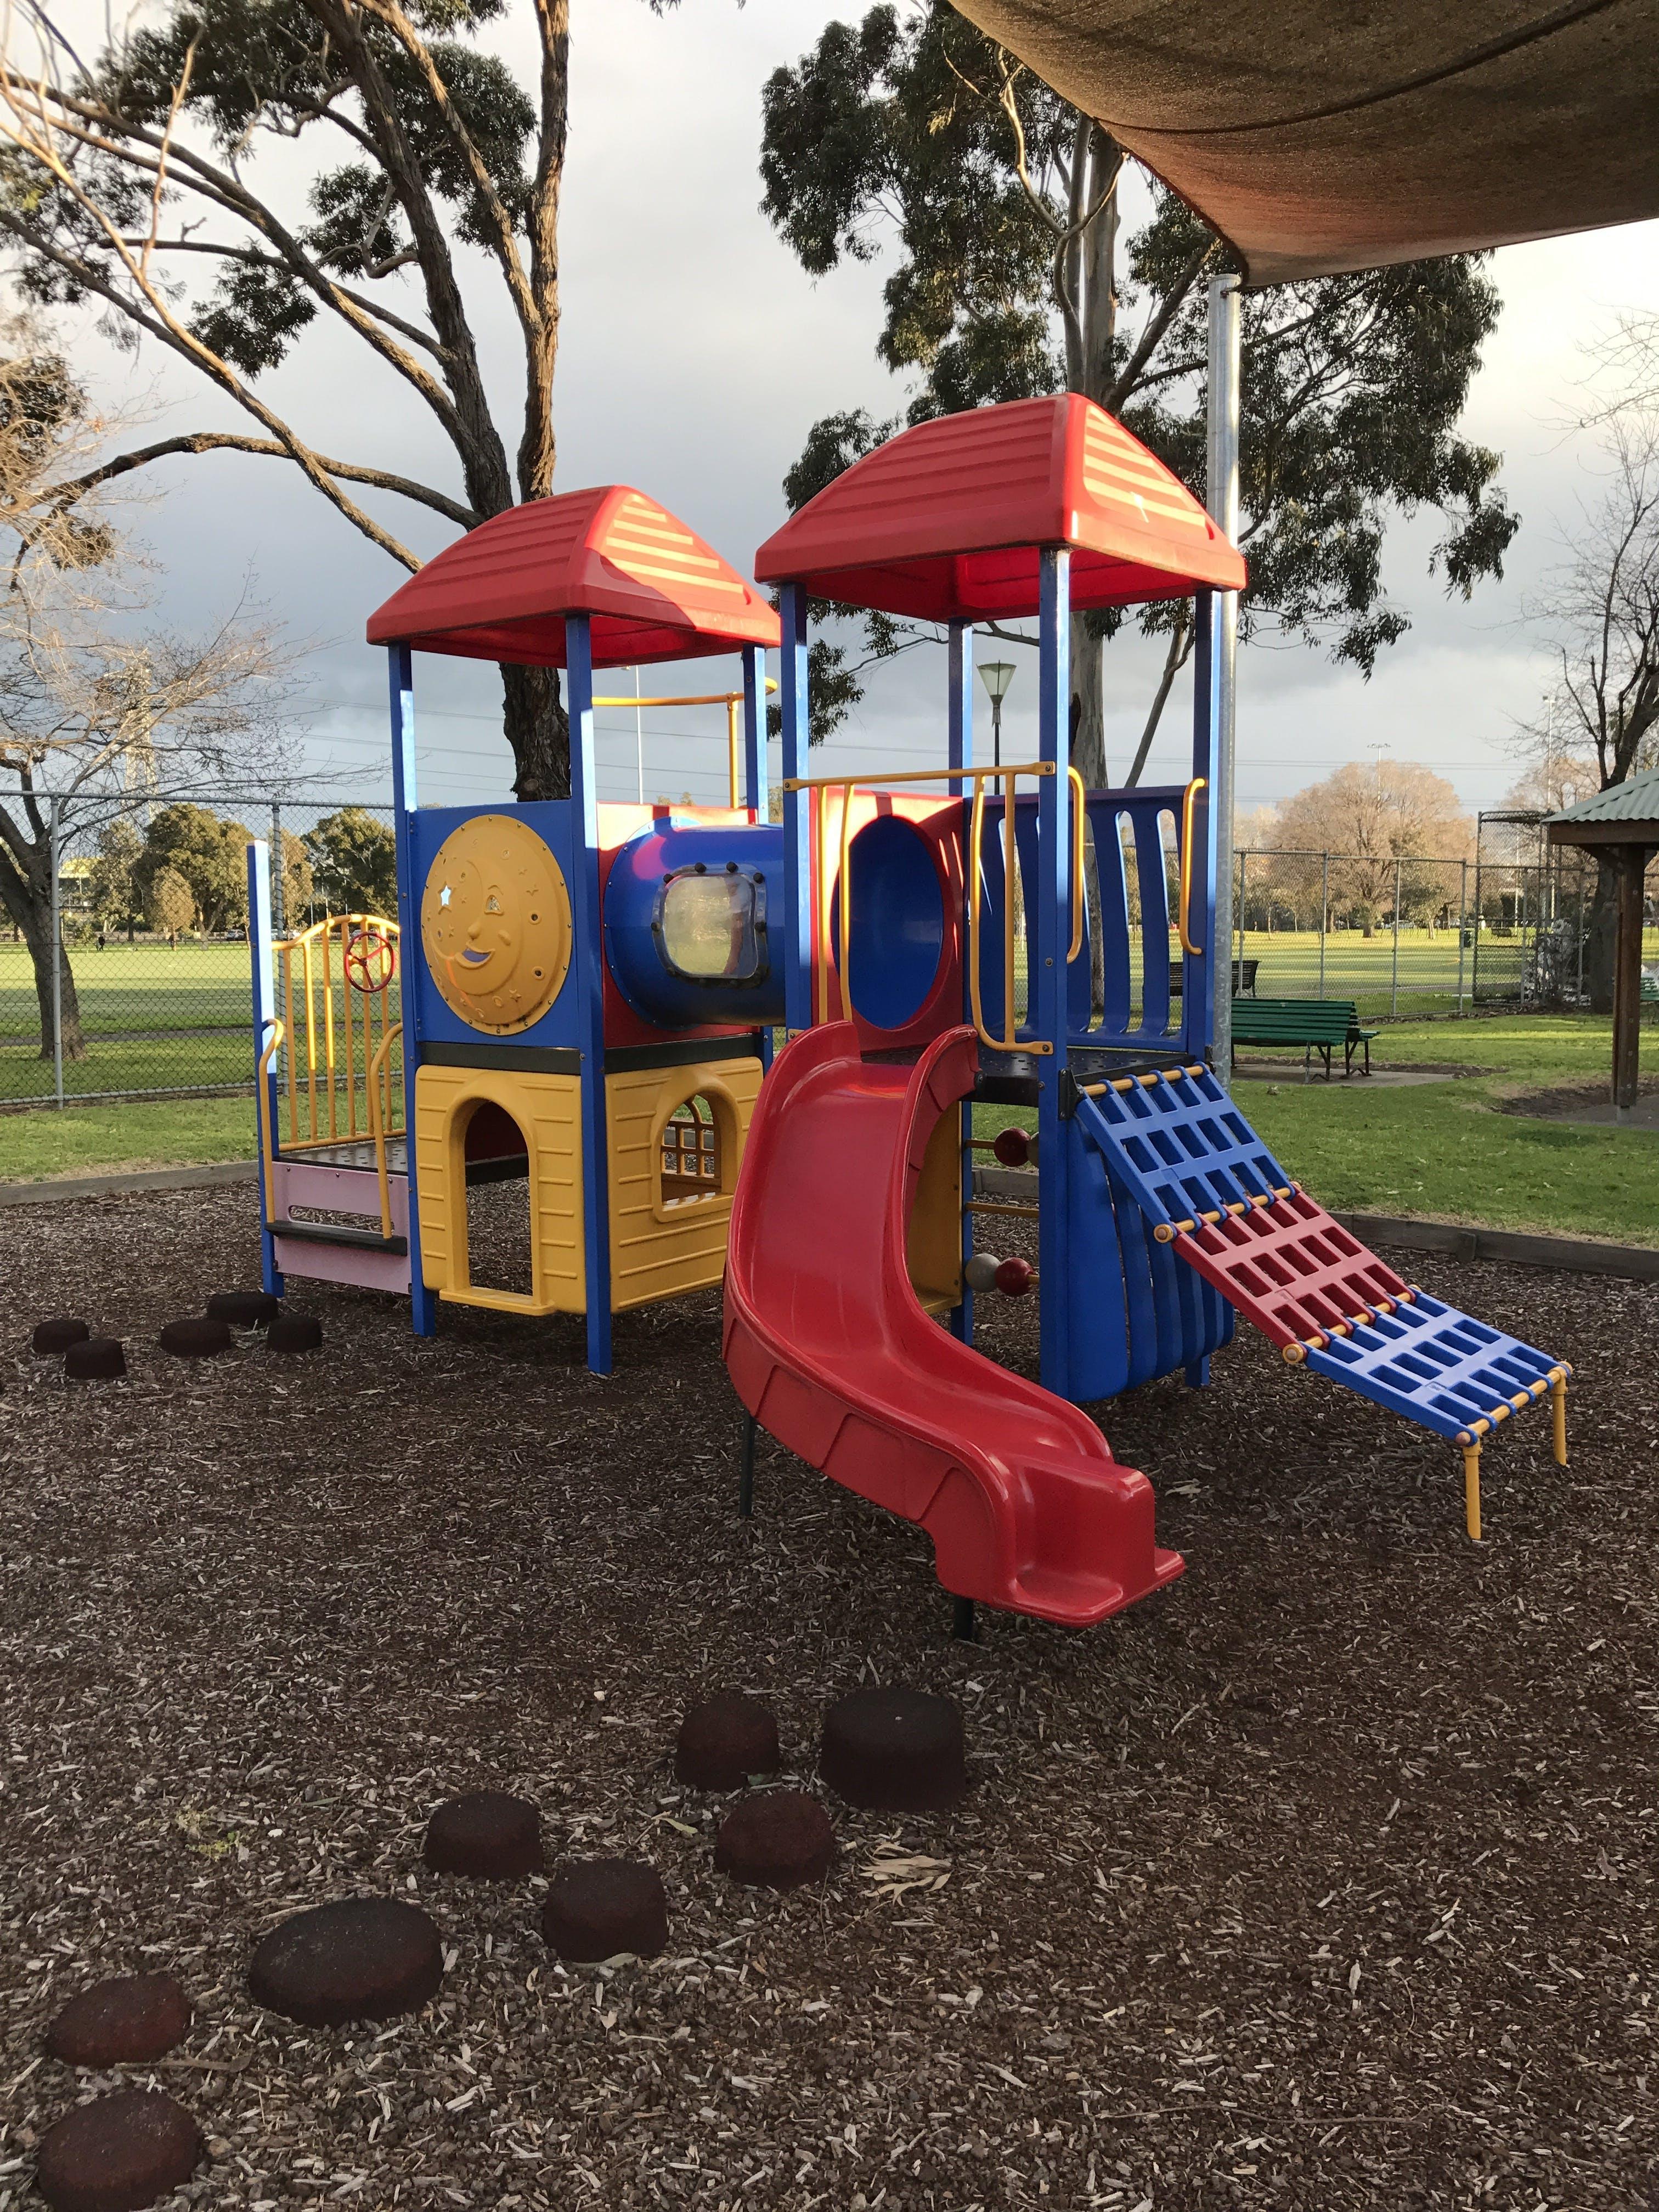 Free stock photo of children, outdoor, playground, slide